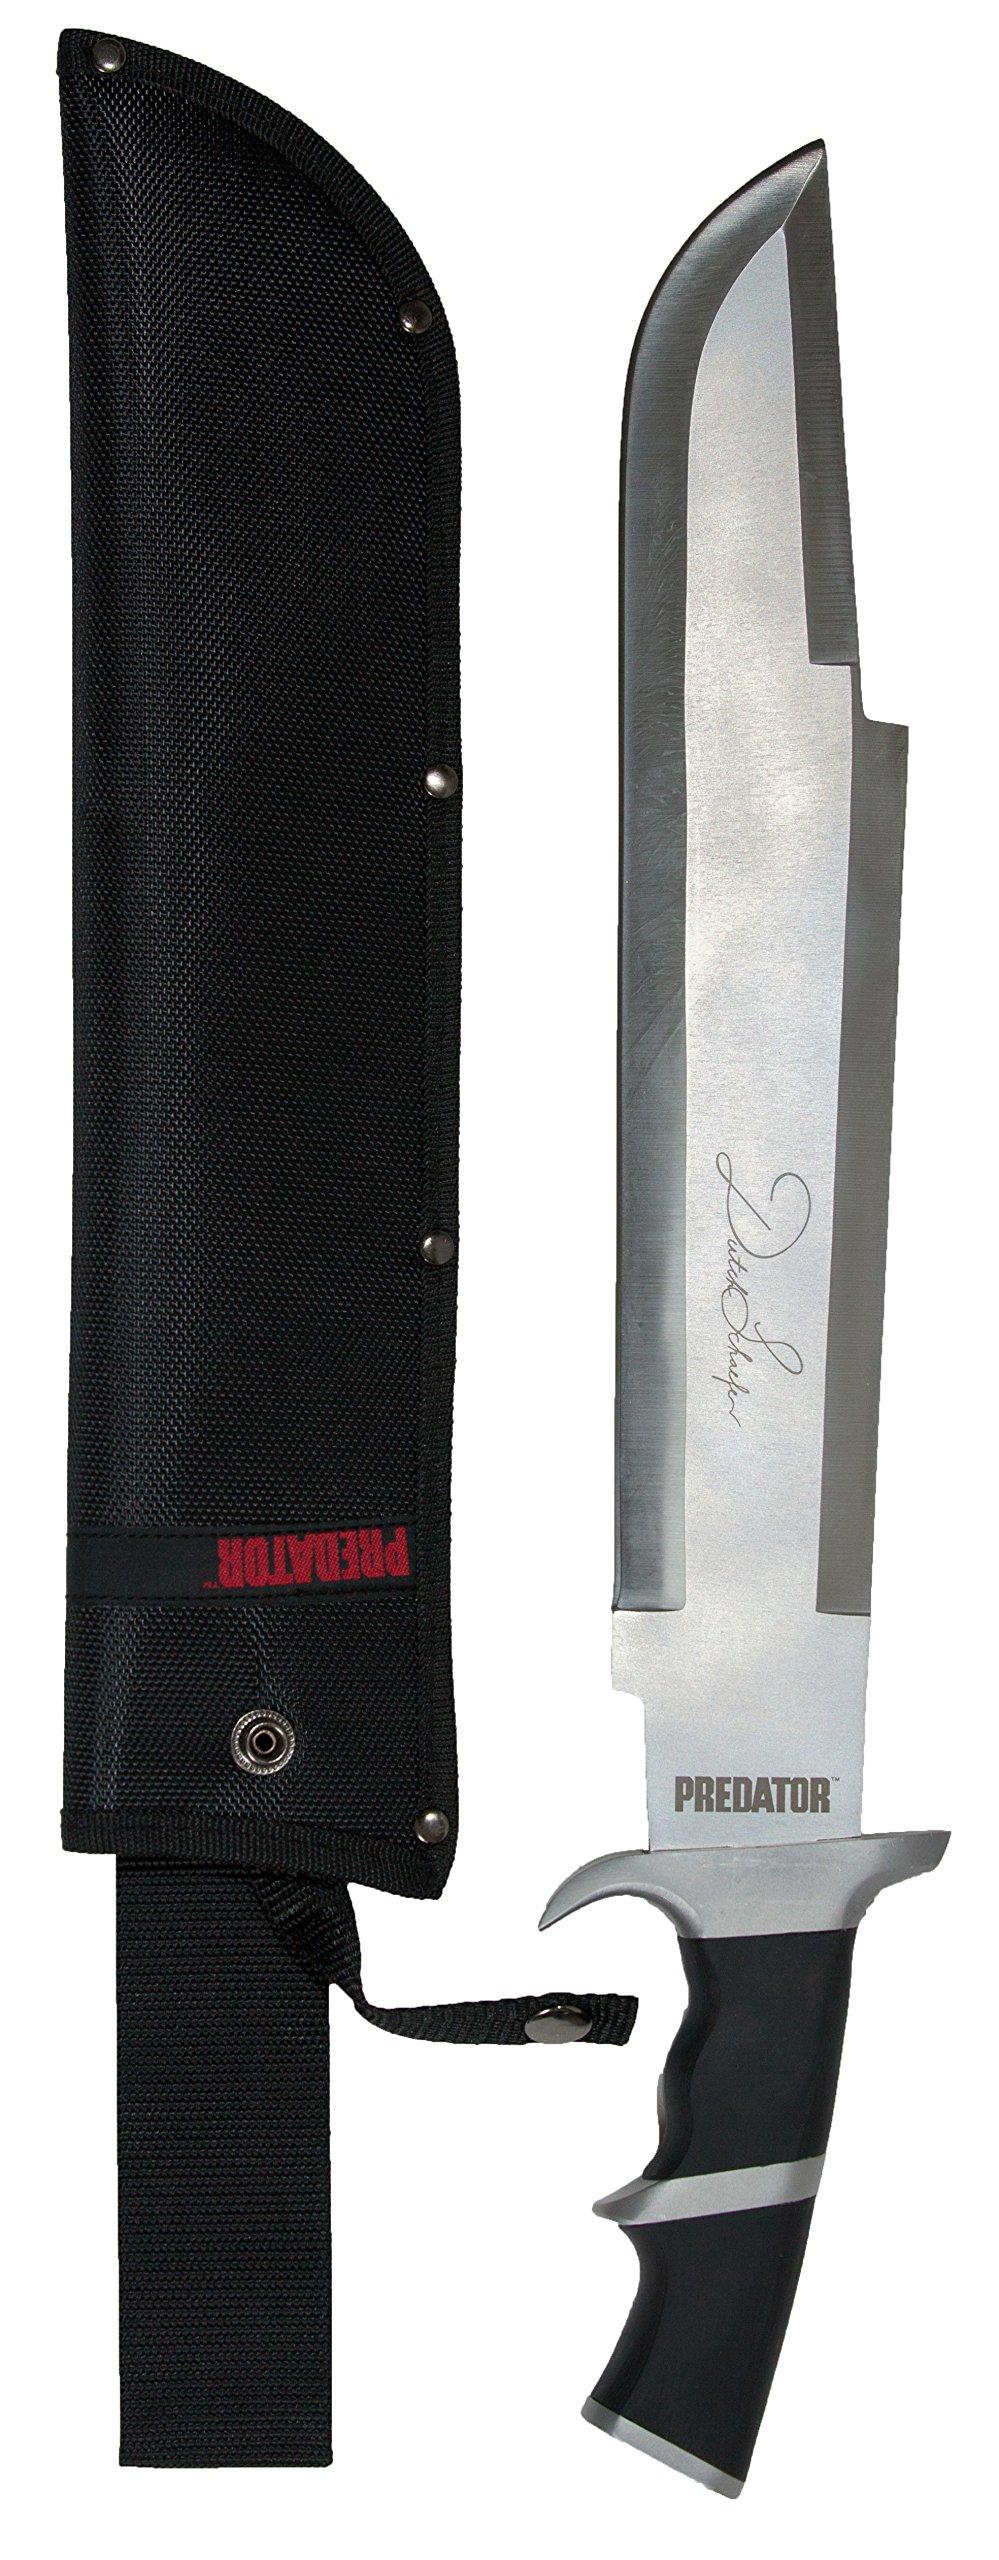 Predator Knife Schwarzenegger Dutch Schaefer Signature Edition by Anglo Arms